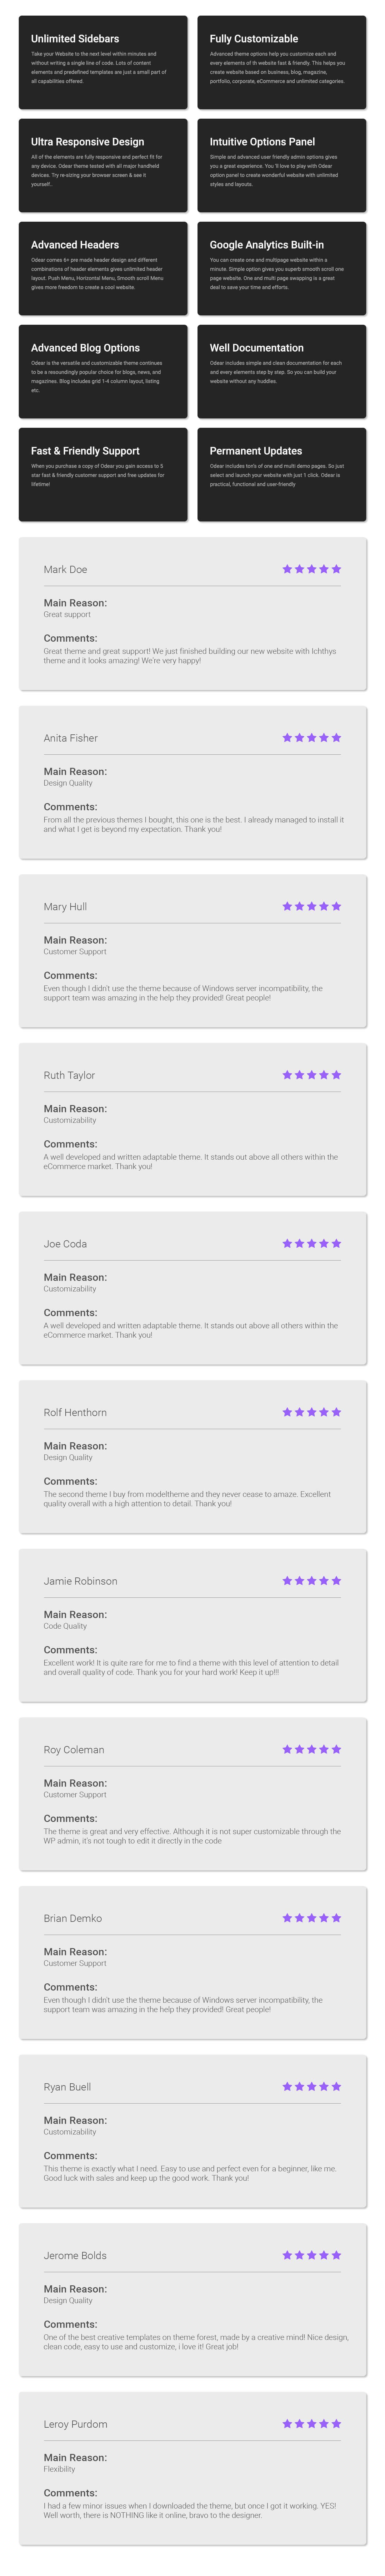 Odear - Multi-Concept Creative WordPress Theme - 4